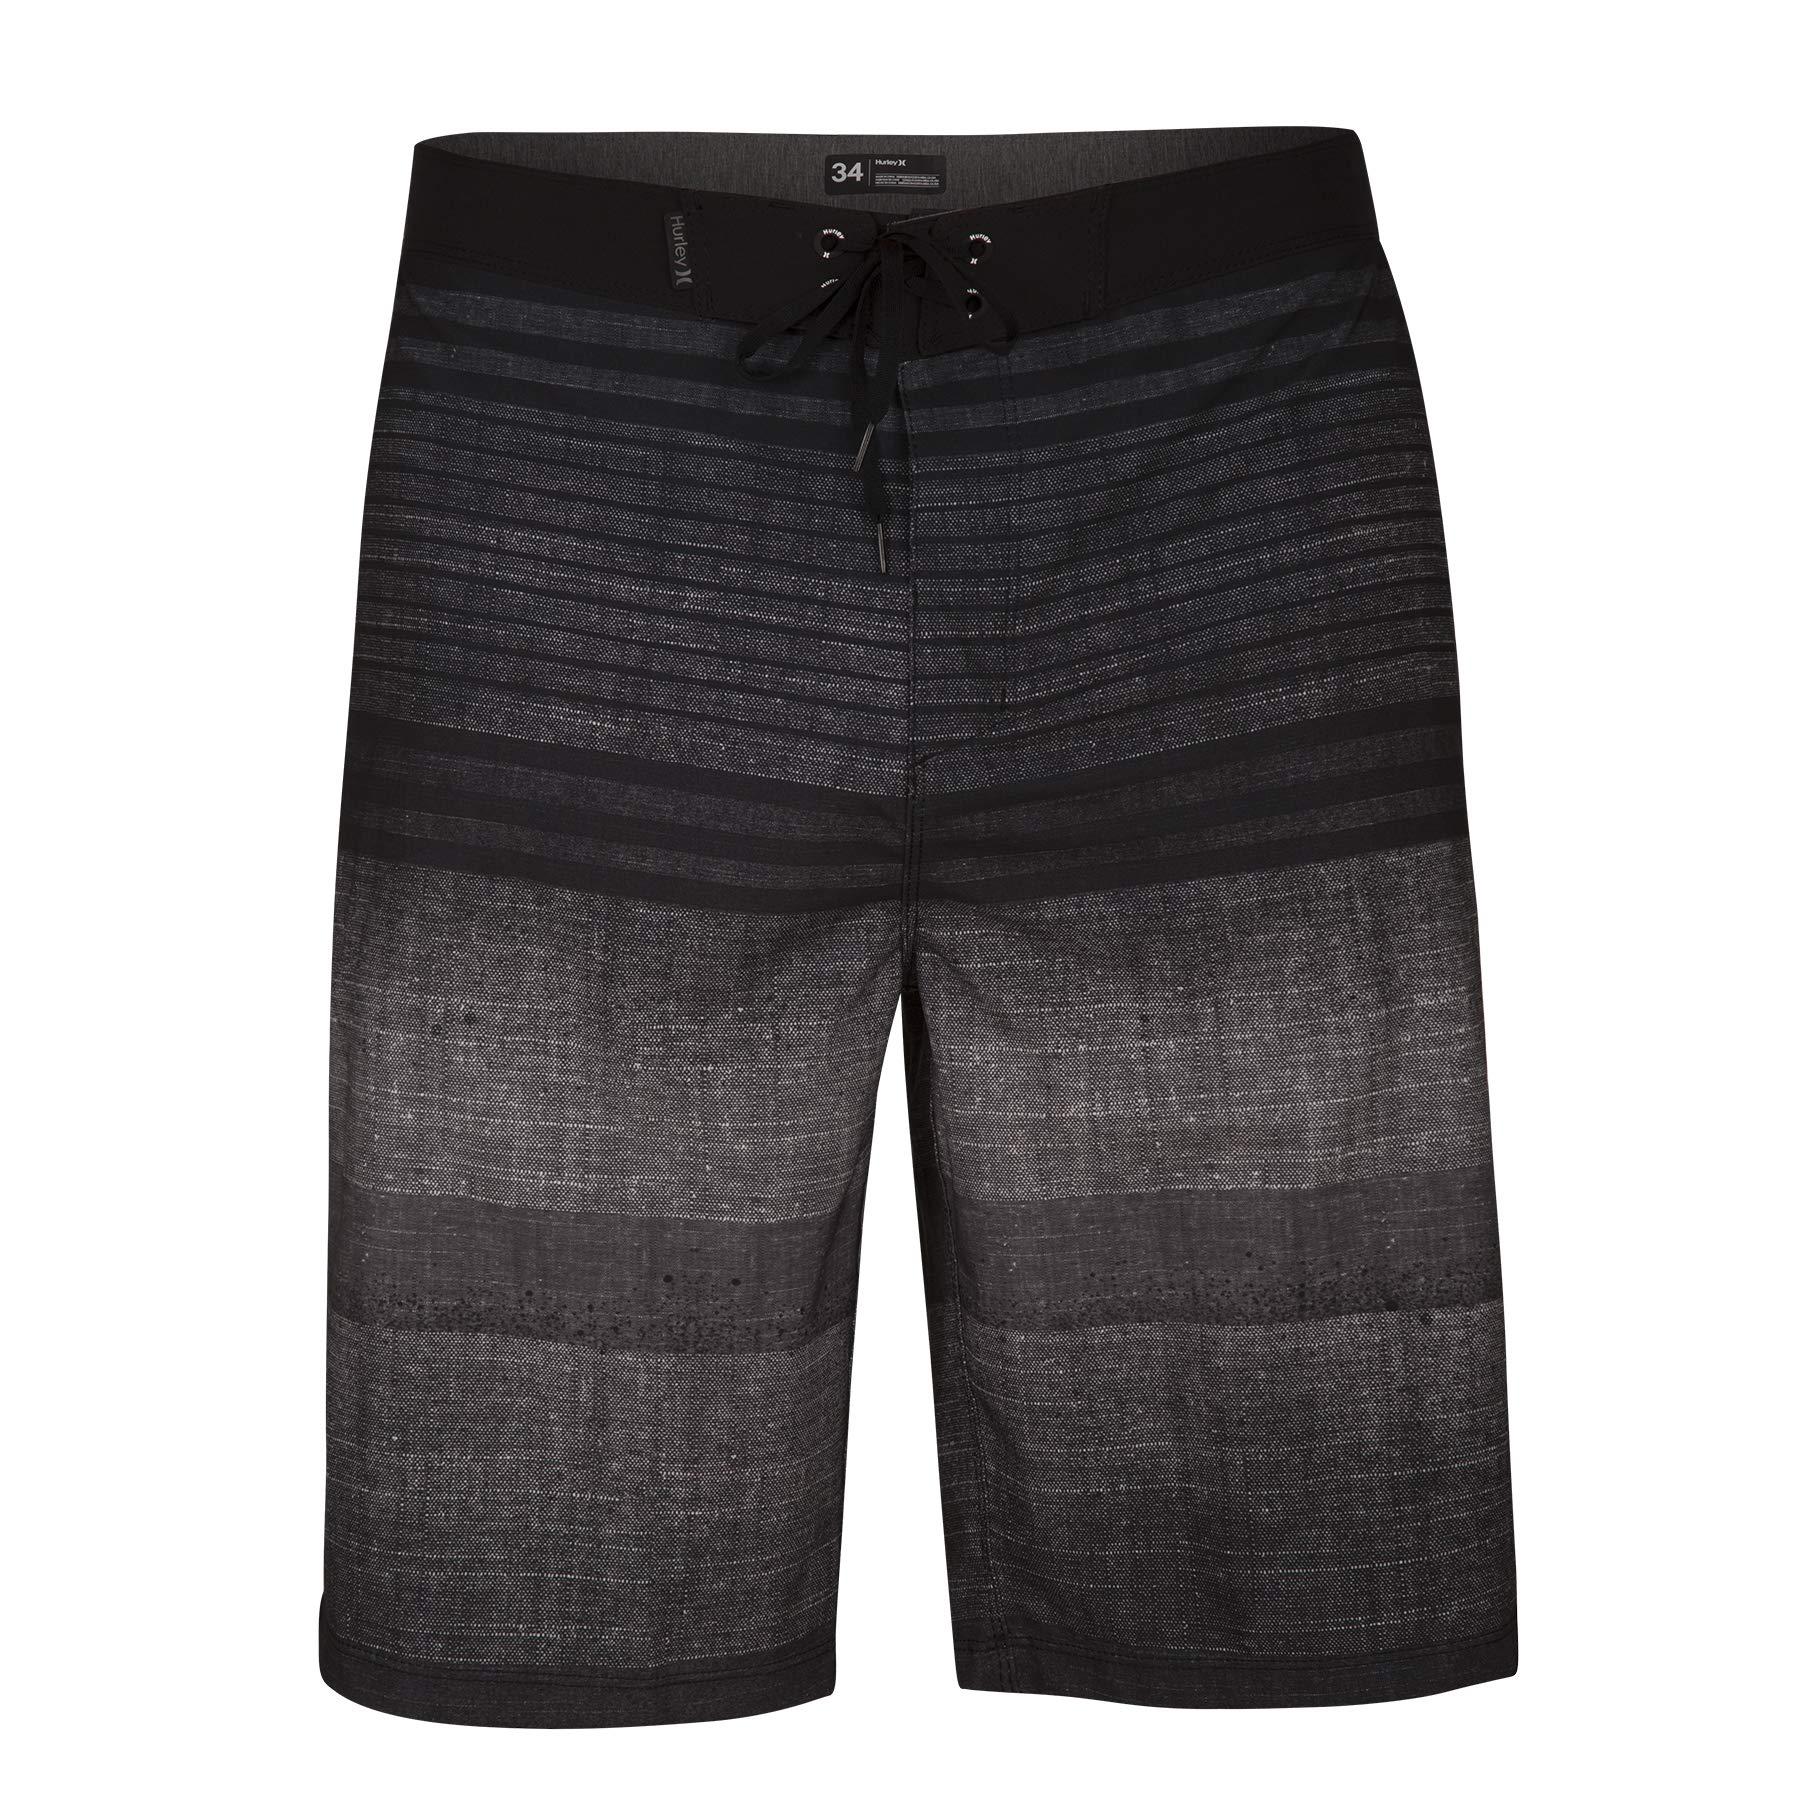 Hurley Men's Phantom Printed 21'' Stretch Boardshort Swim Short, Black, 34